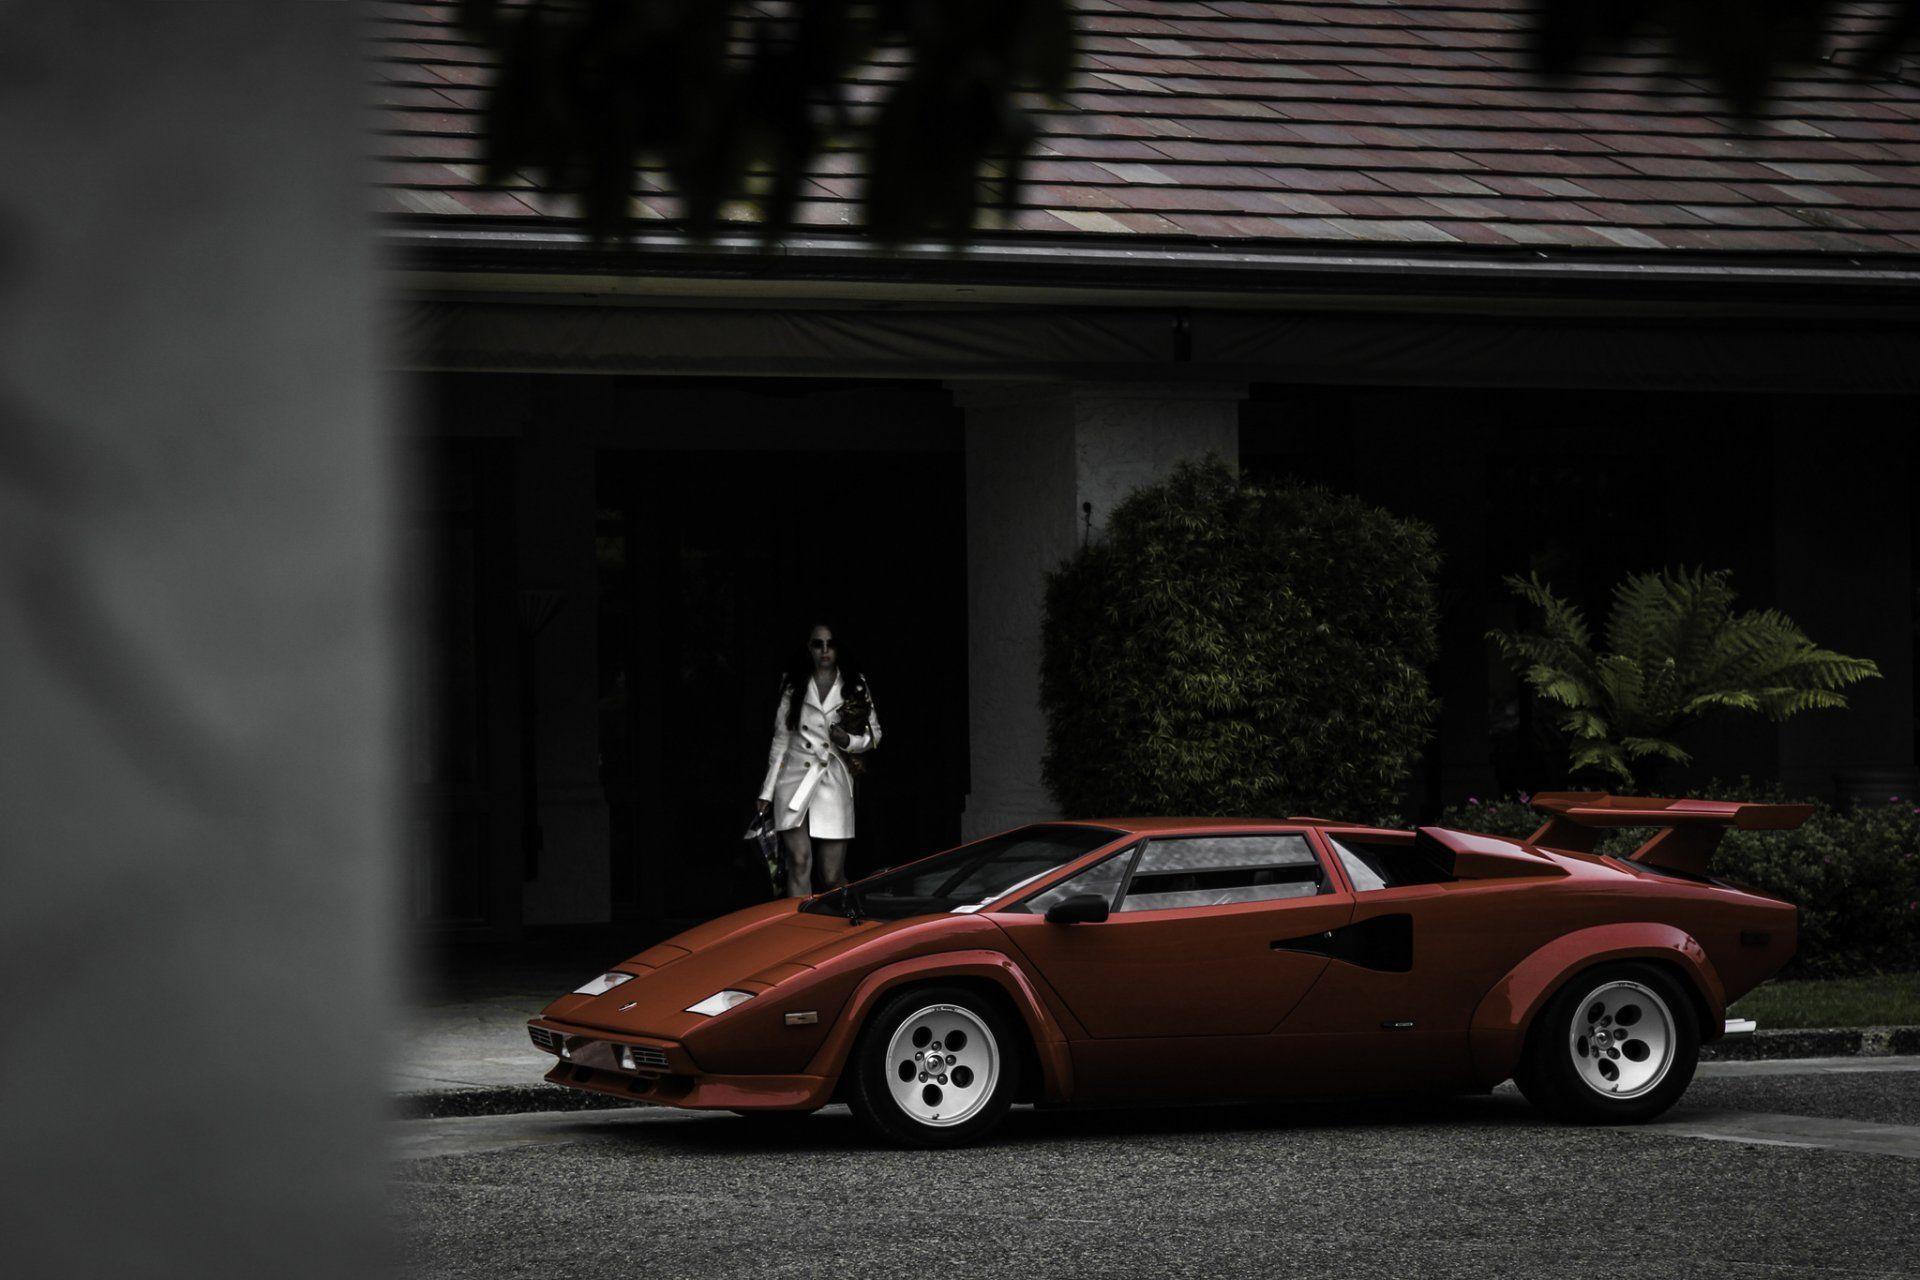 Lamborghini Countach Wallpapers - Wallpaper Cave